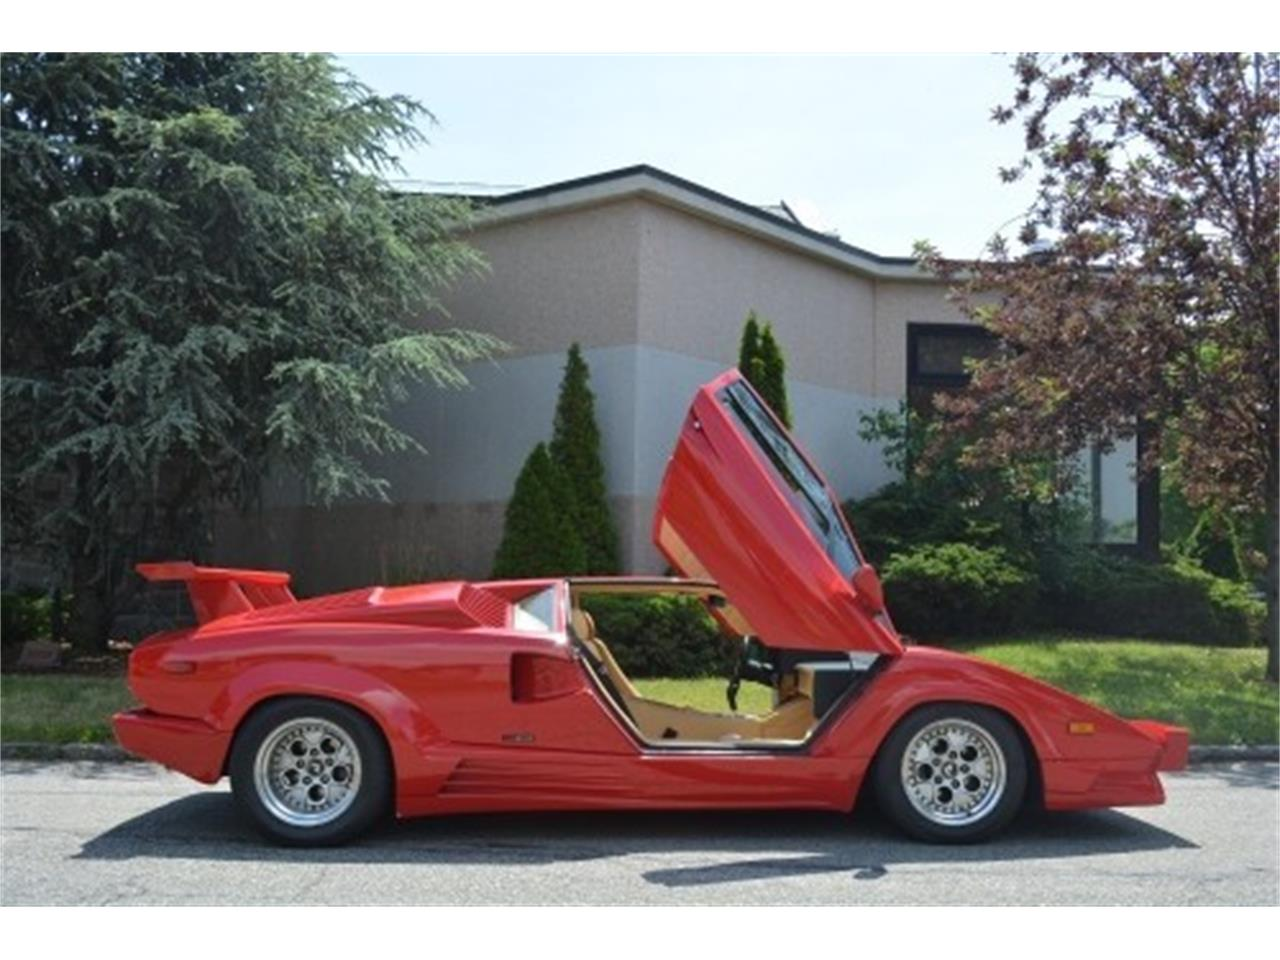 Large Picture of 1989 Lamborghini Countach - $249,500.00 - EYKT